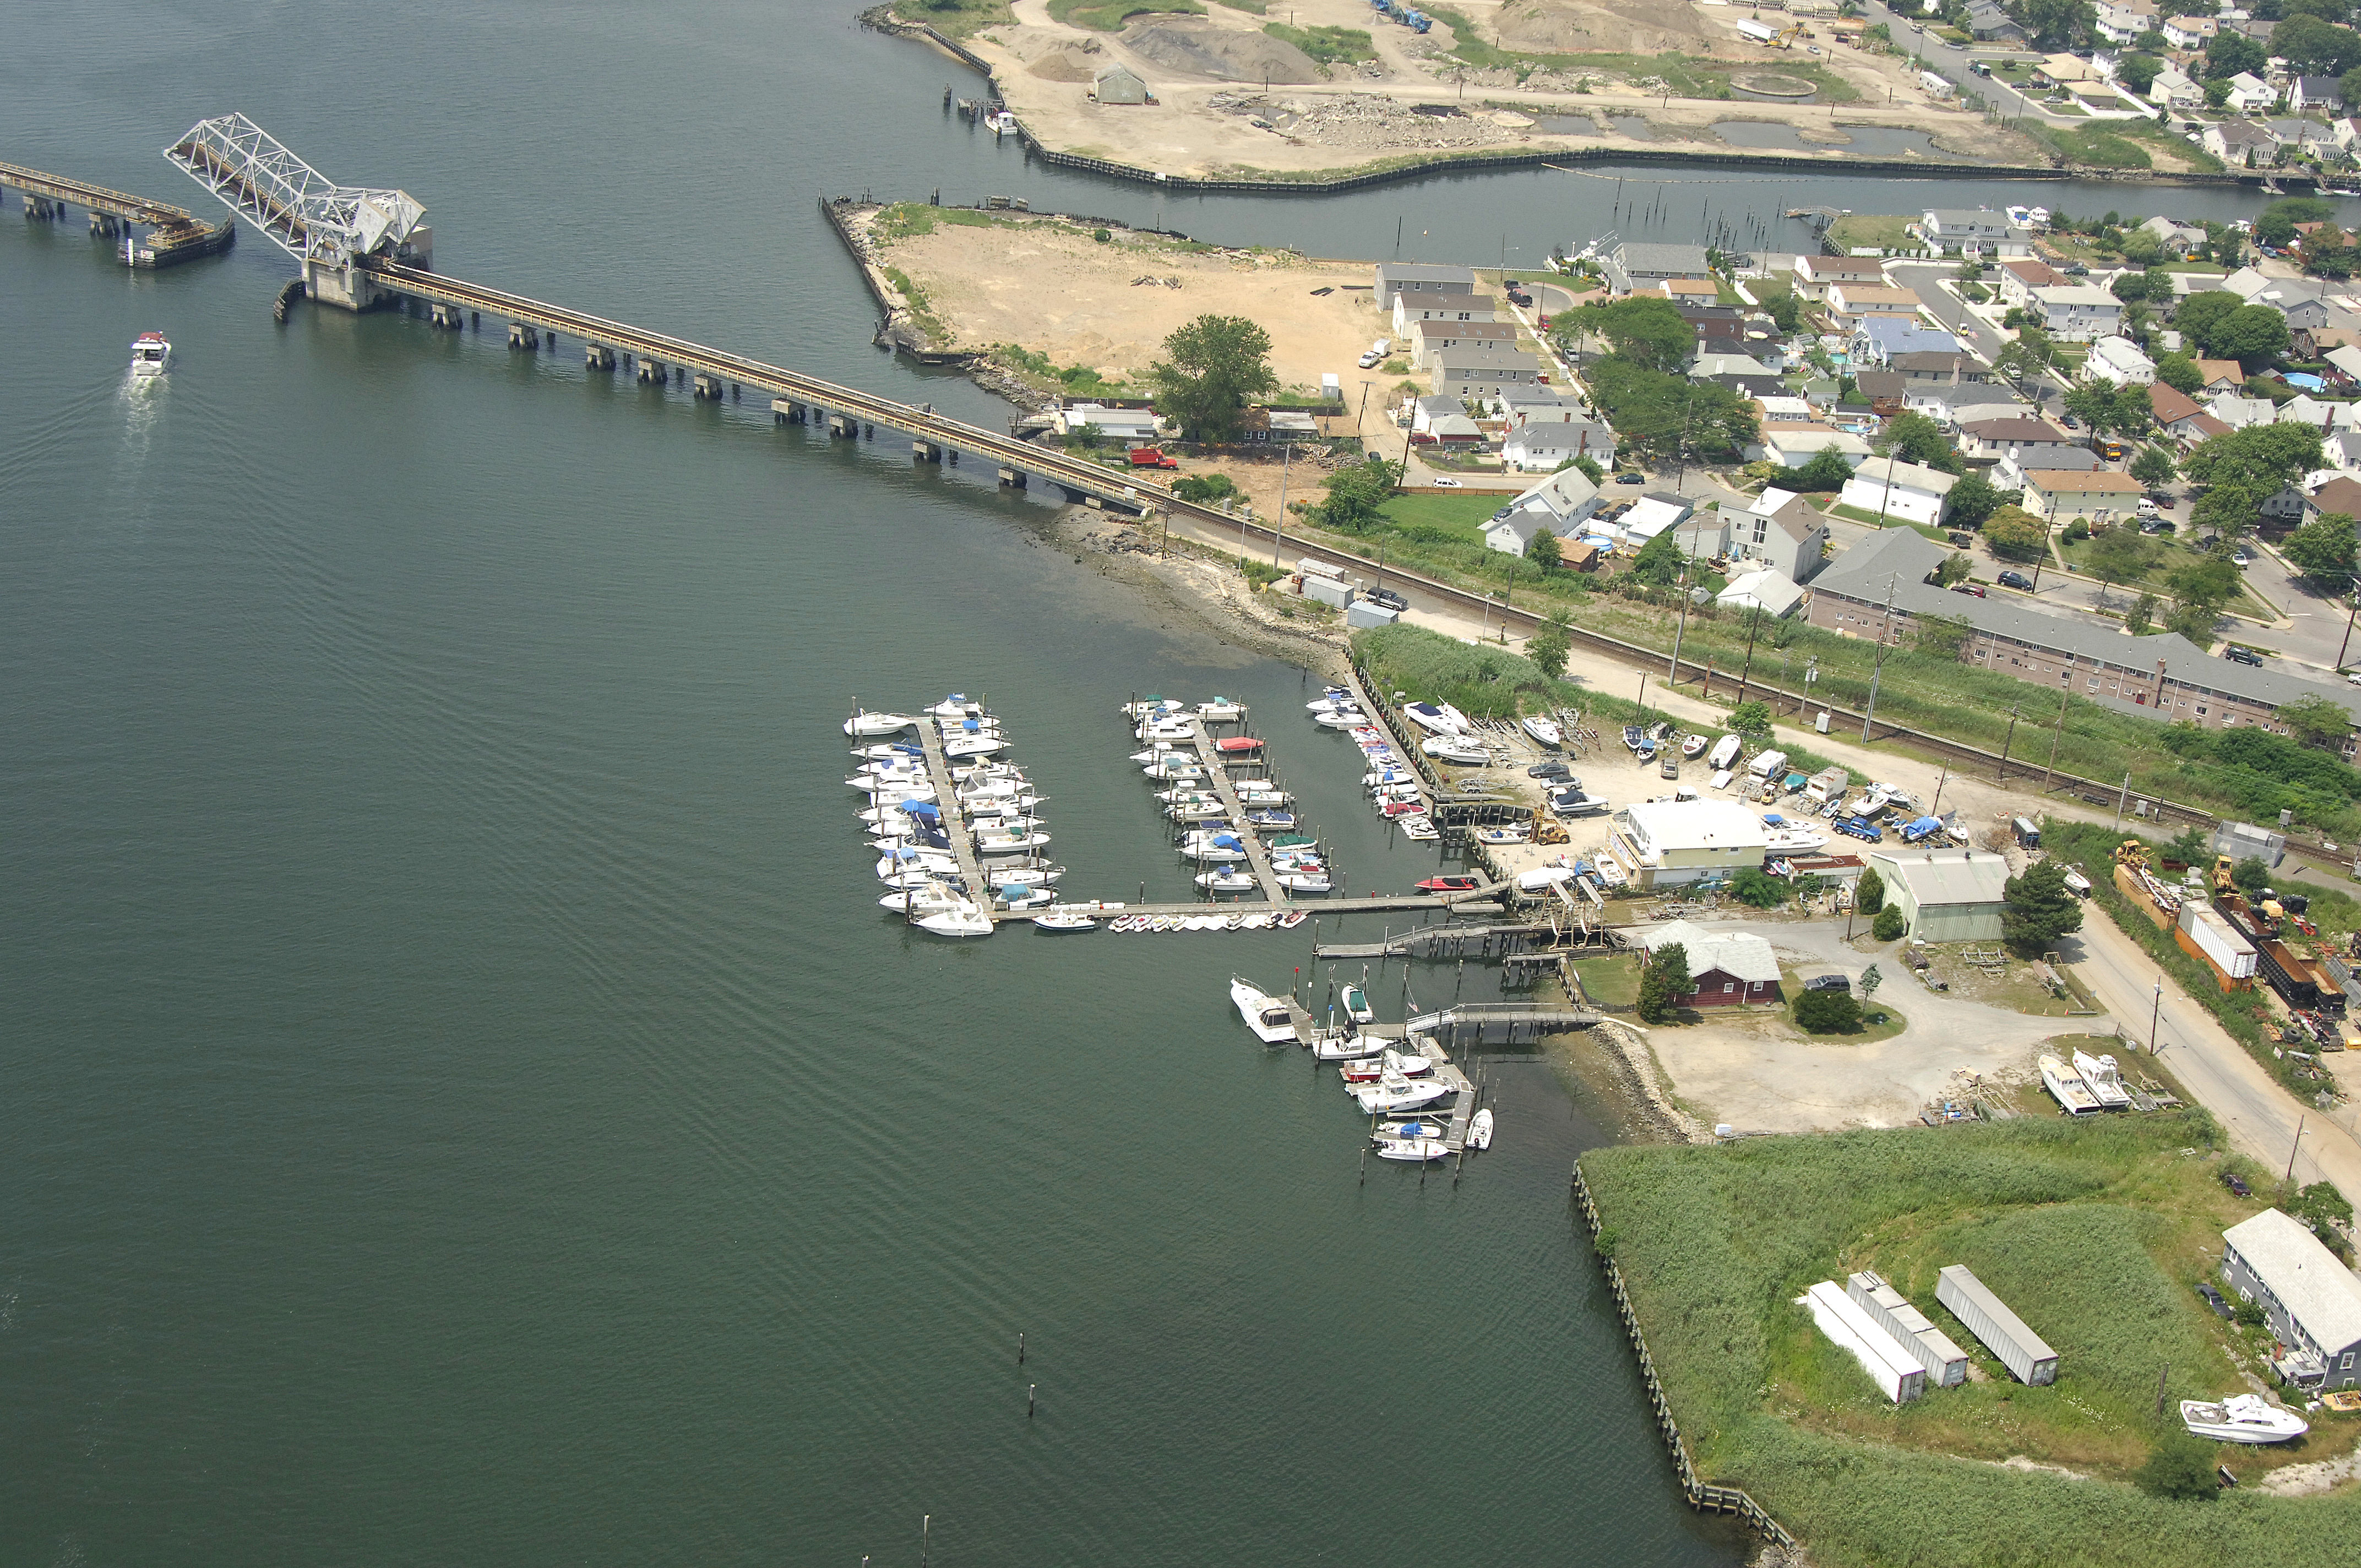 Apache Yacht Club In Island Park NY United States